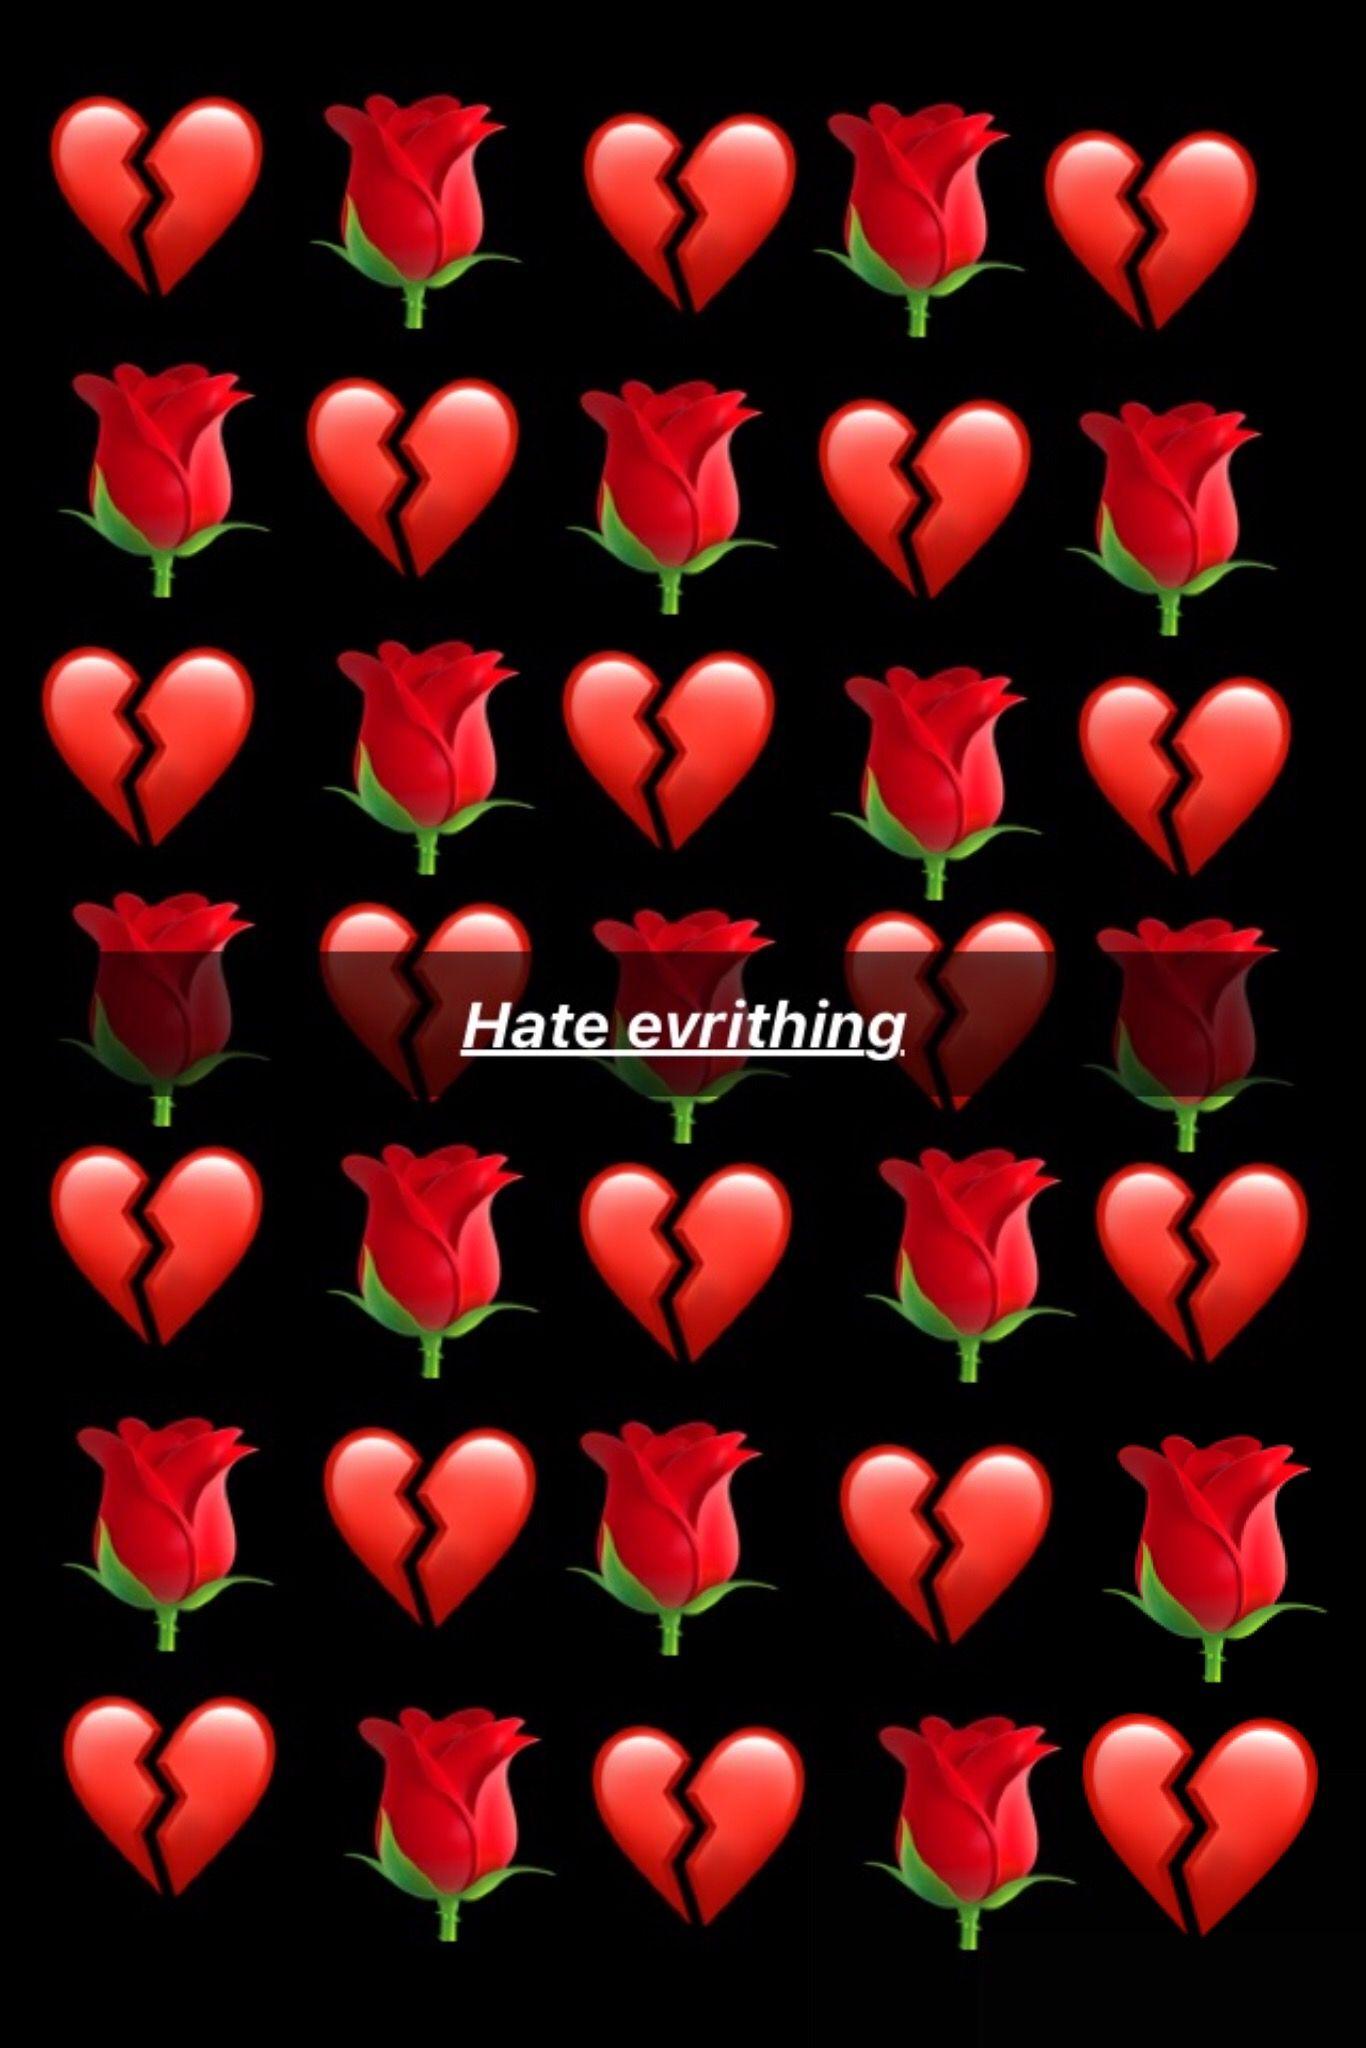 Roses Hate Evrithing Life Broke Heart Emo Wallpaper